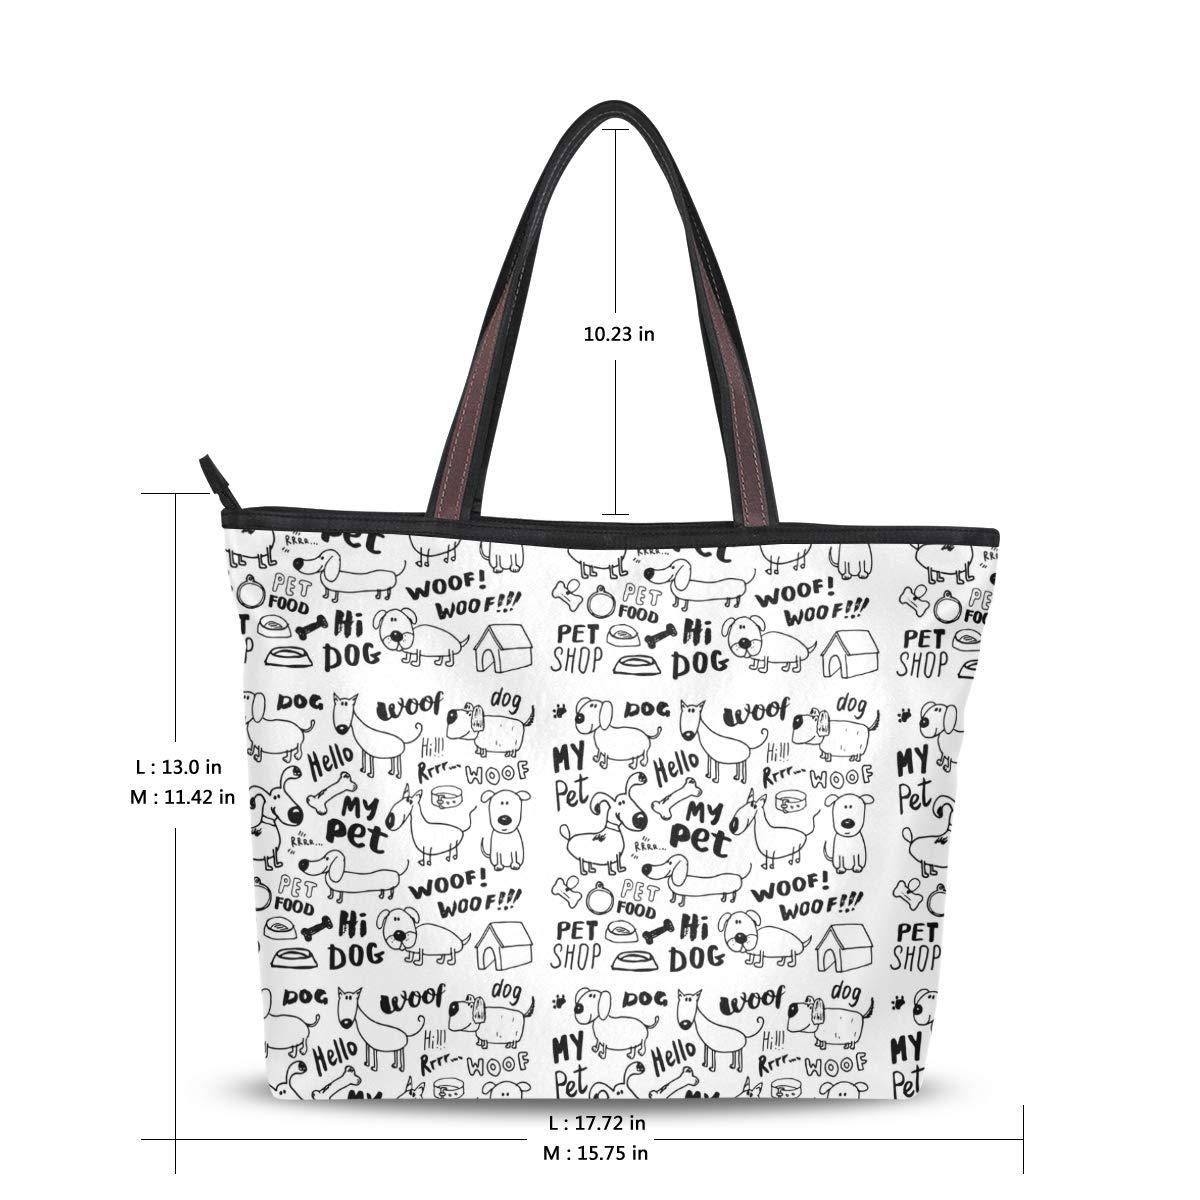 Women Handle Funny Dogs Pets Satchel Handbags Tote Purse Shoulder Bag Big Capacity Handbag